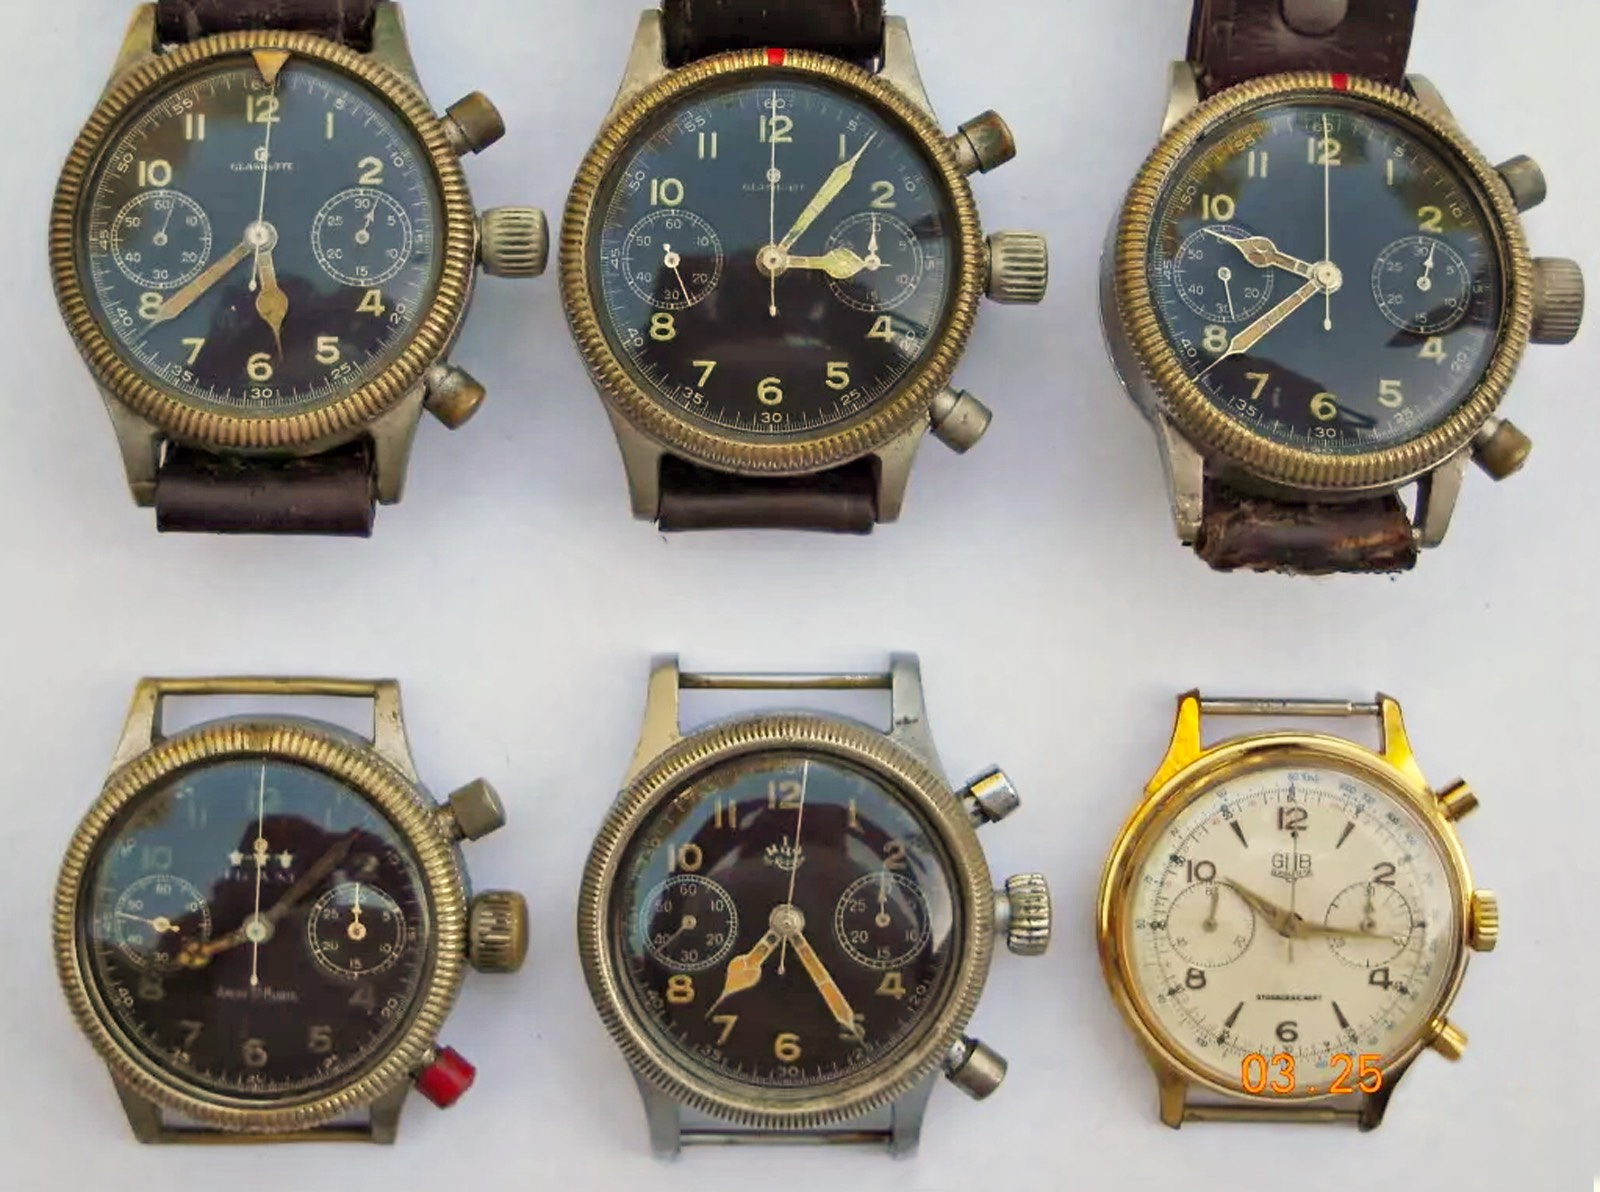 GUB Stossgesichert Calibre 64 Flyback Pilot Chronograph - Vintage Corner